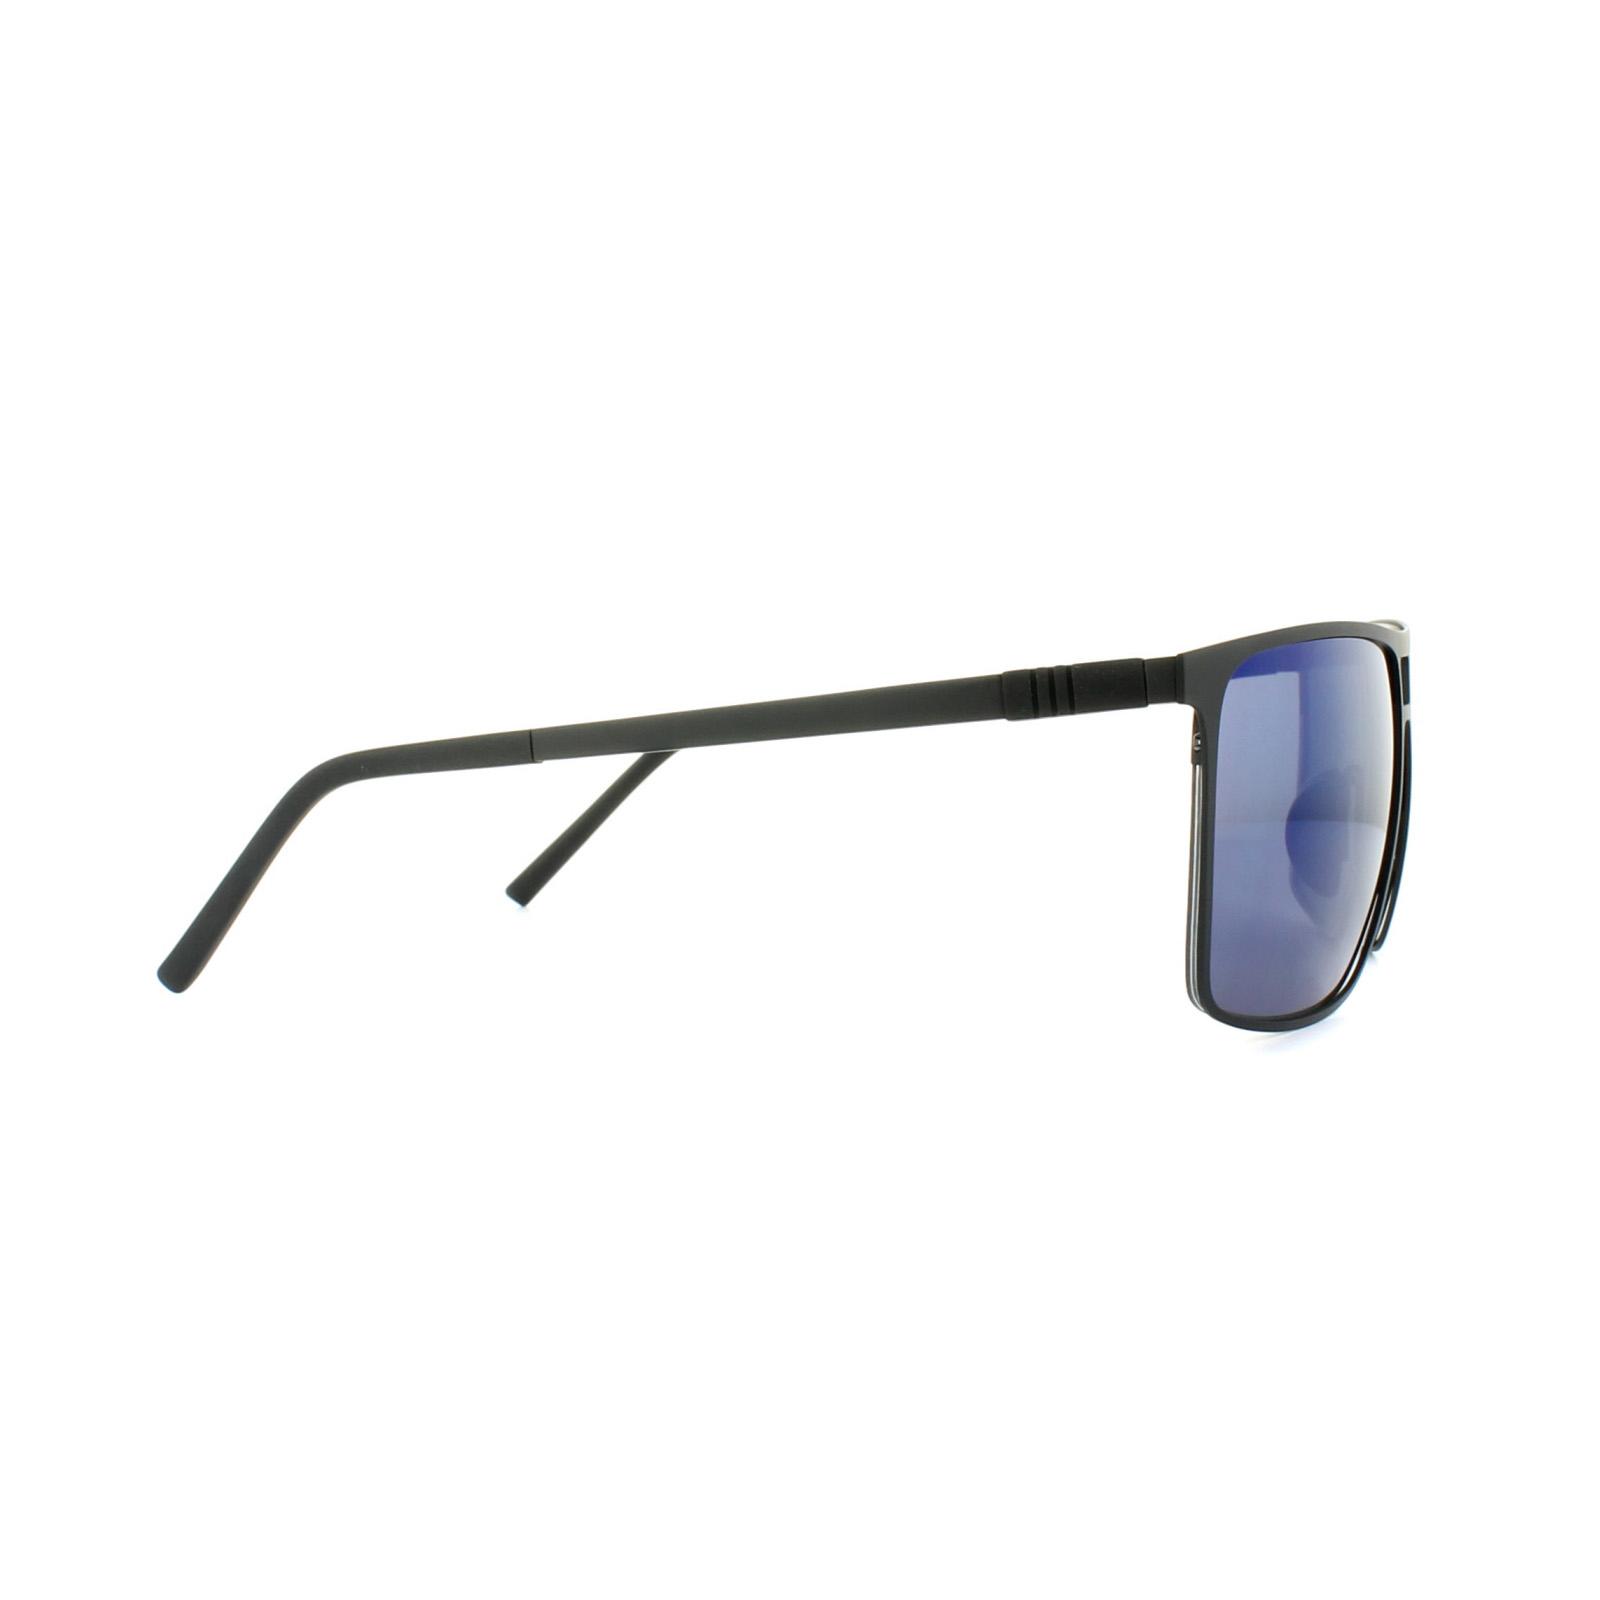 0c8373c64e Details about Porsche Design Sunglasses P8610 A V790 Black Dark Blue Mirror